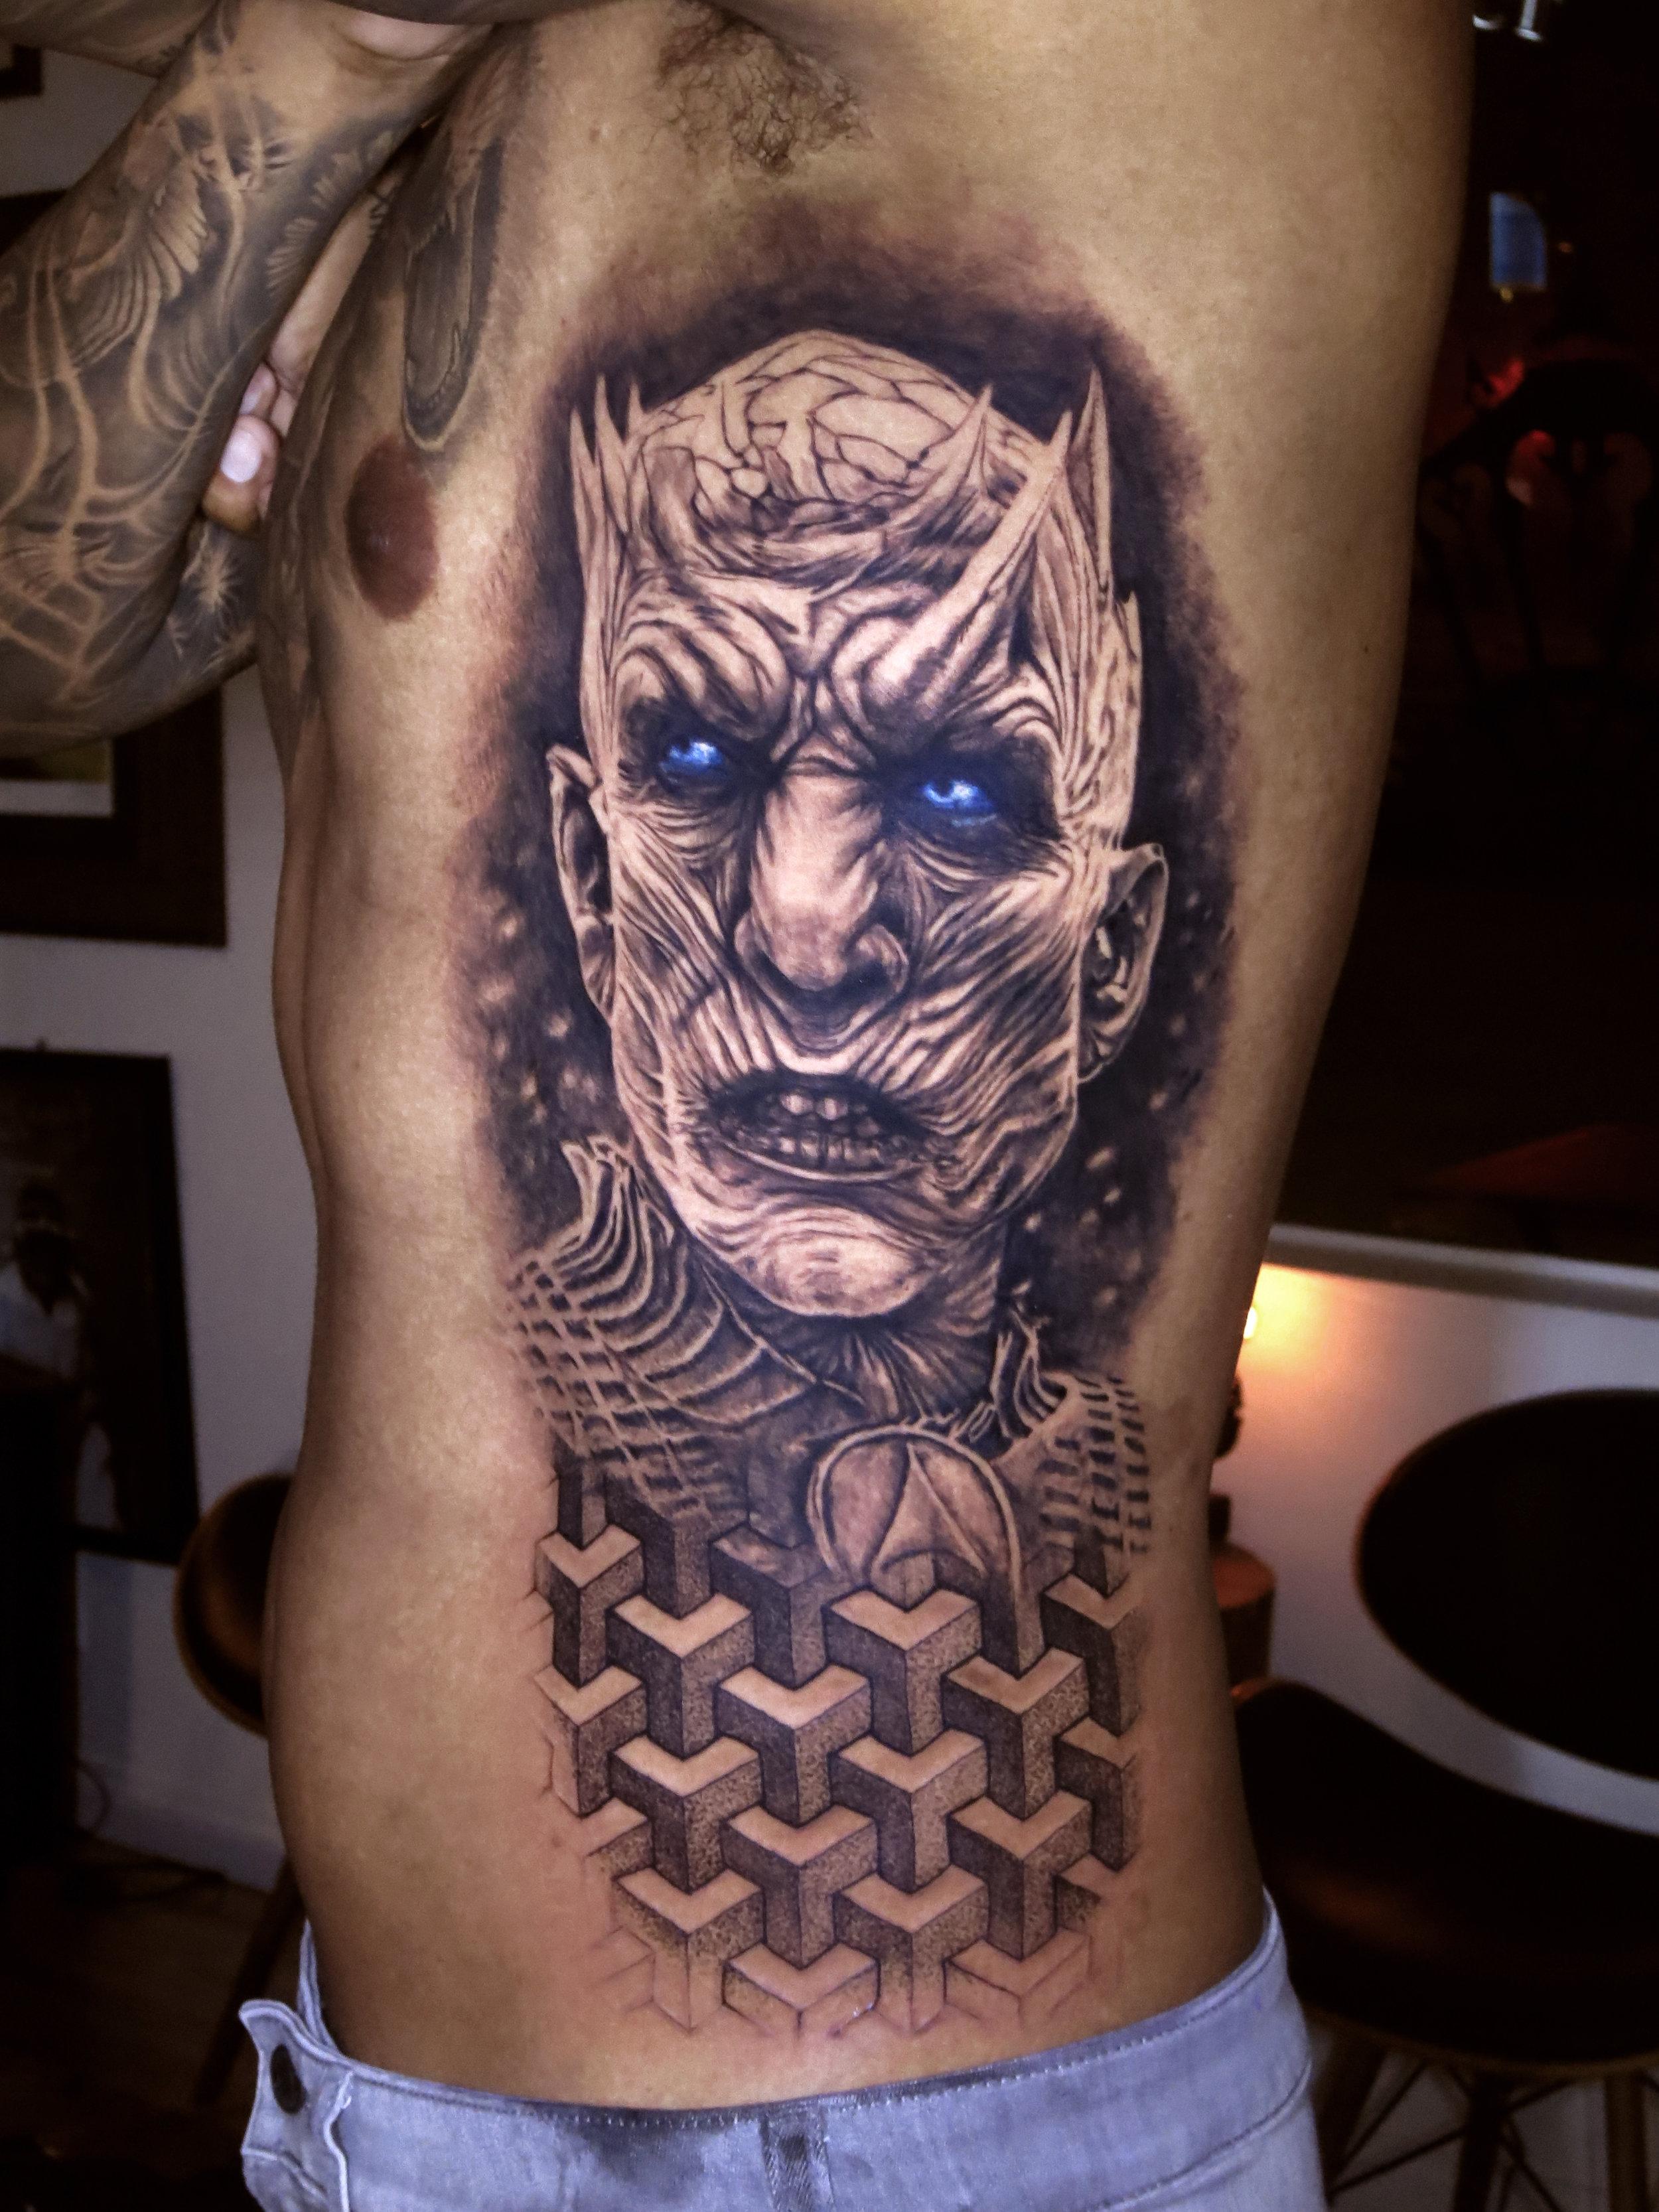 night king white walker game of thrones london reese tattoo.jpg